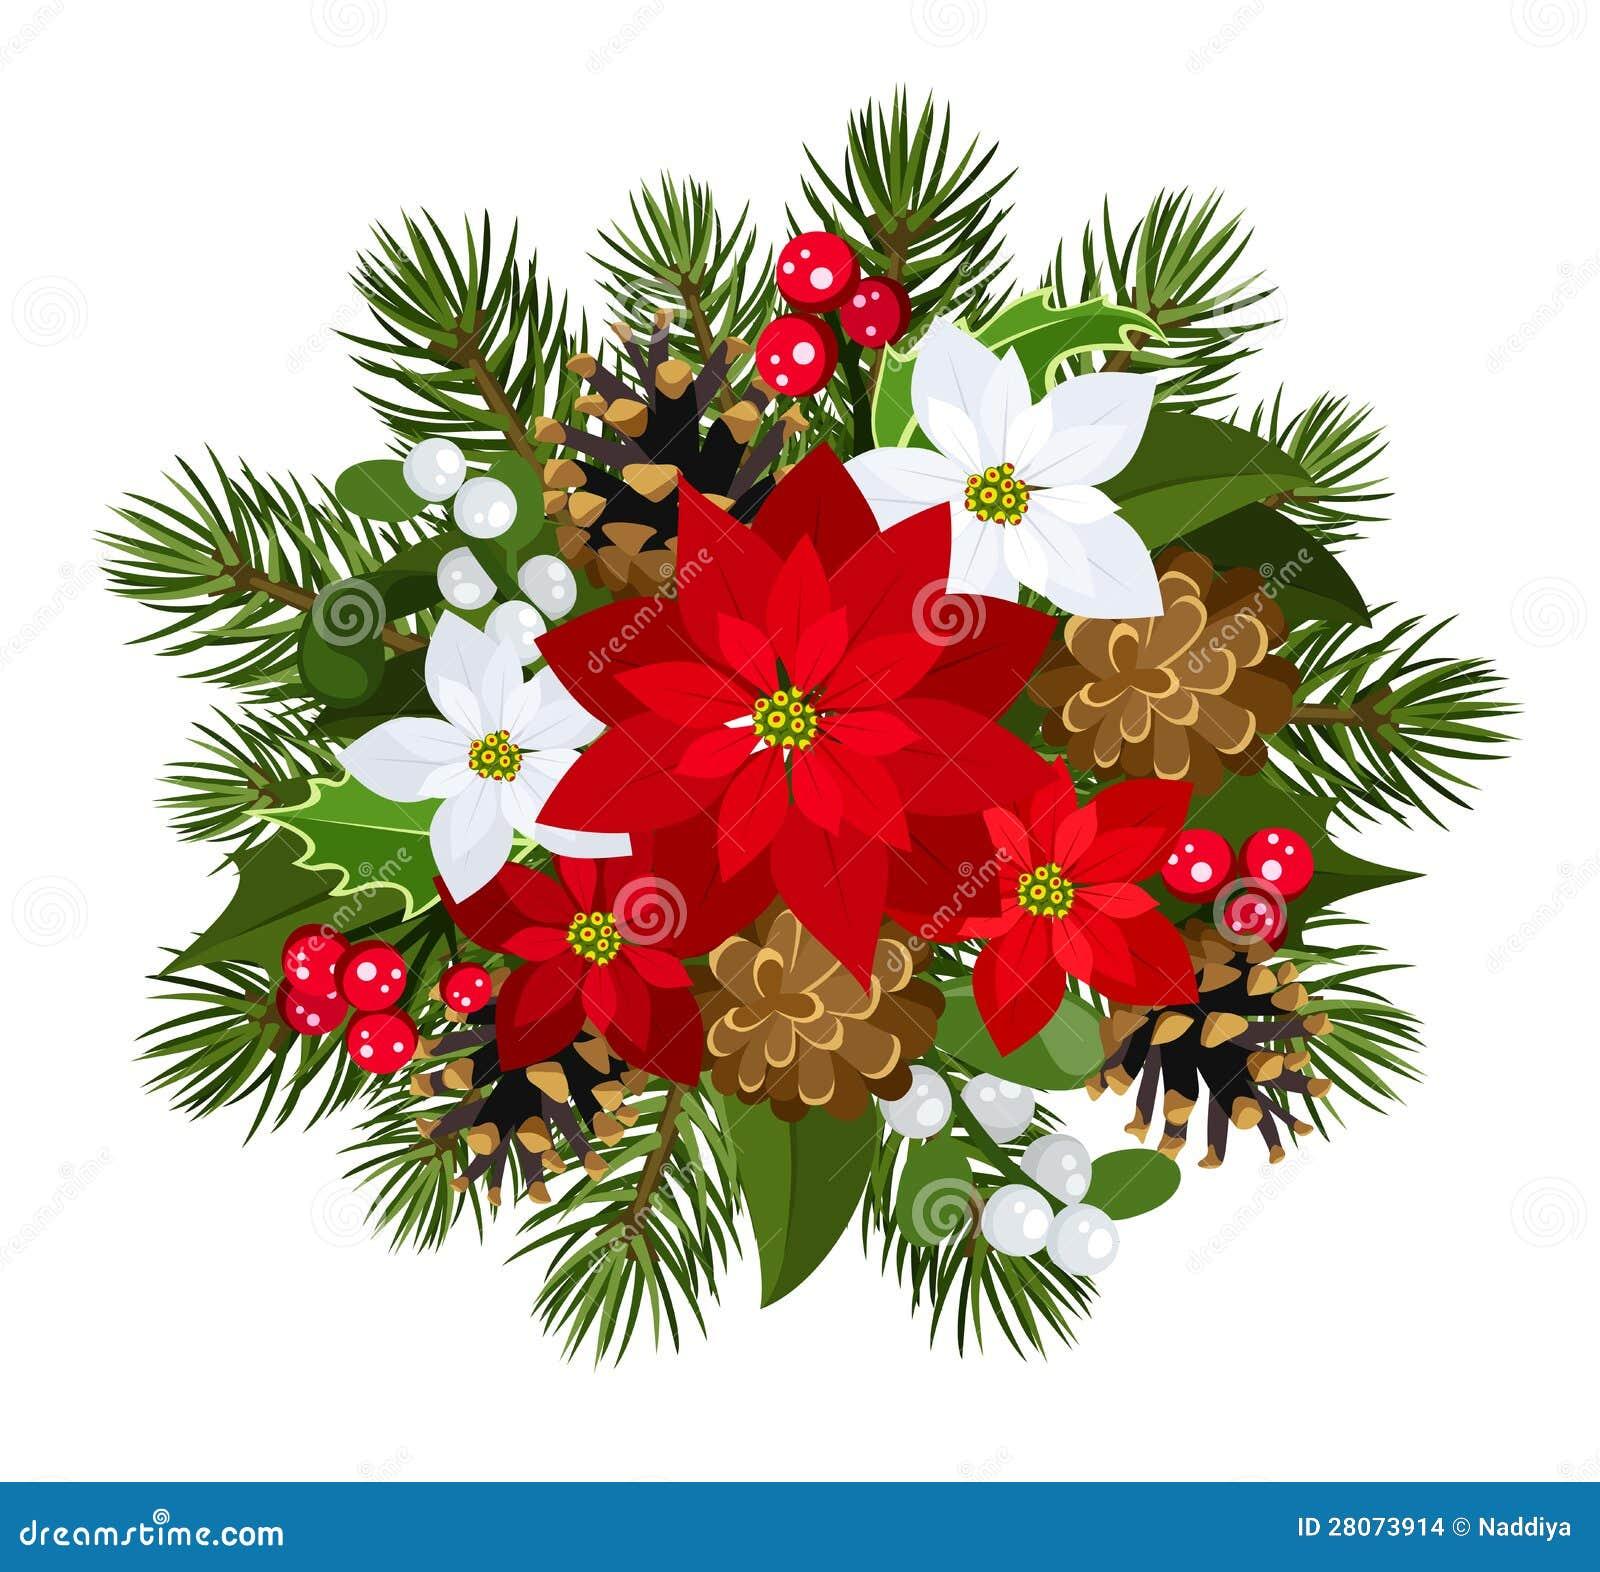 #C70412 Christmas Decoration. Vector Illustration. Stock Images  6361 décoration noel commerce 1300x1294 px @ aertt.com